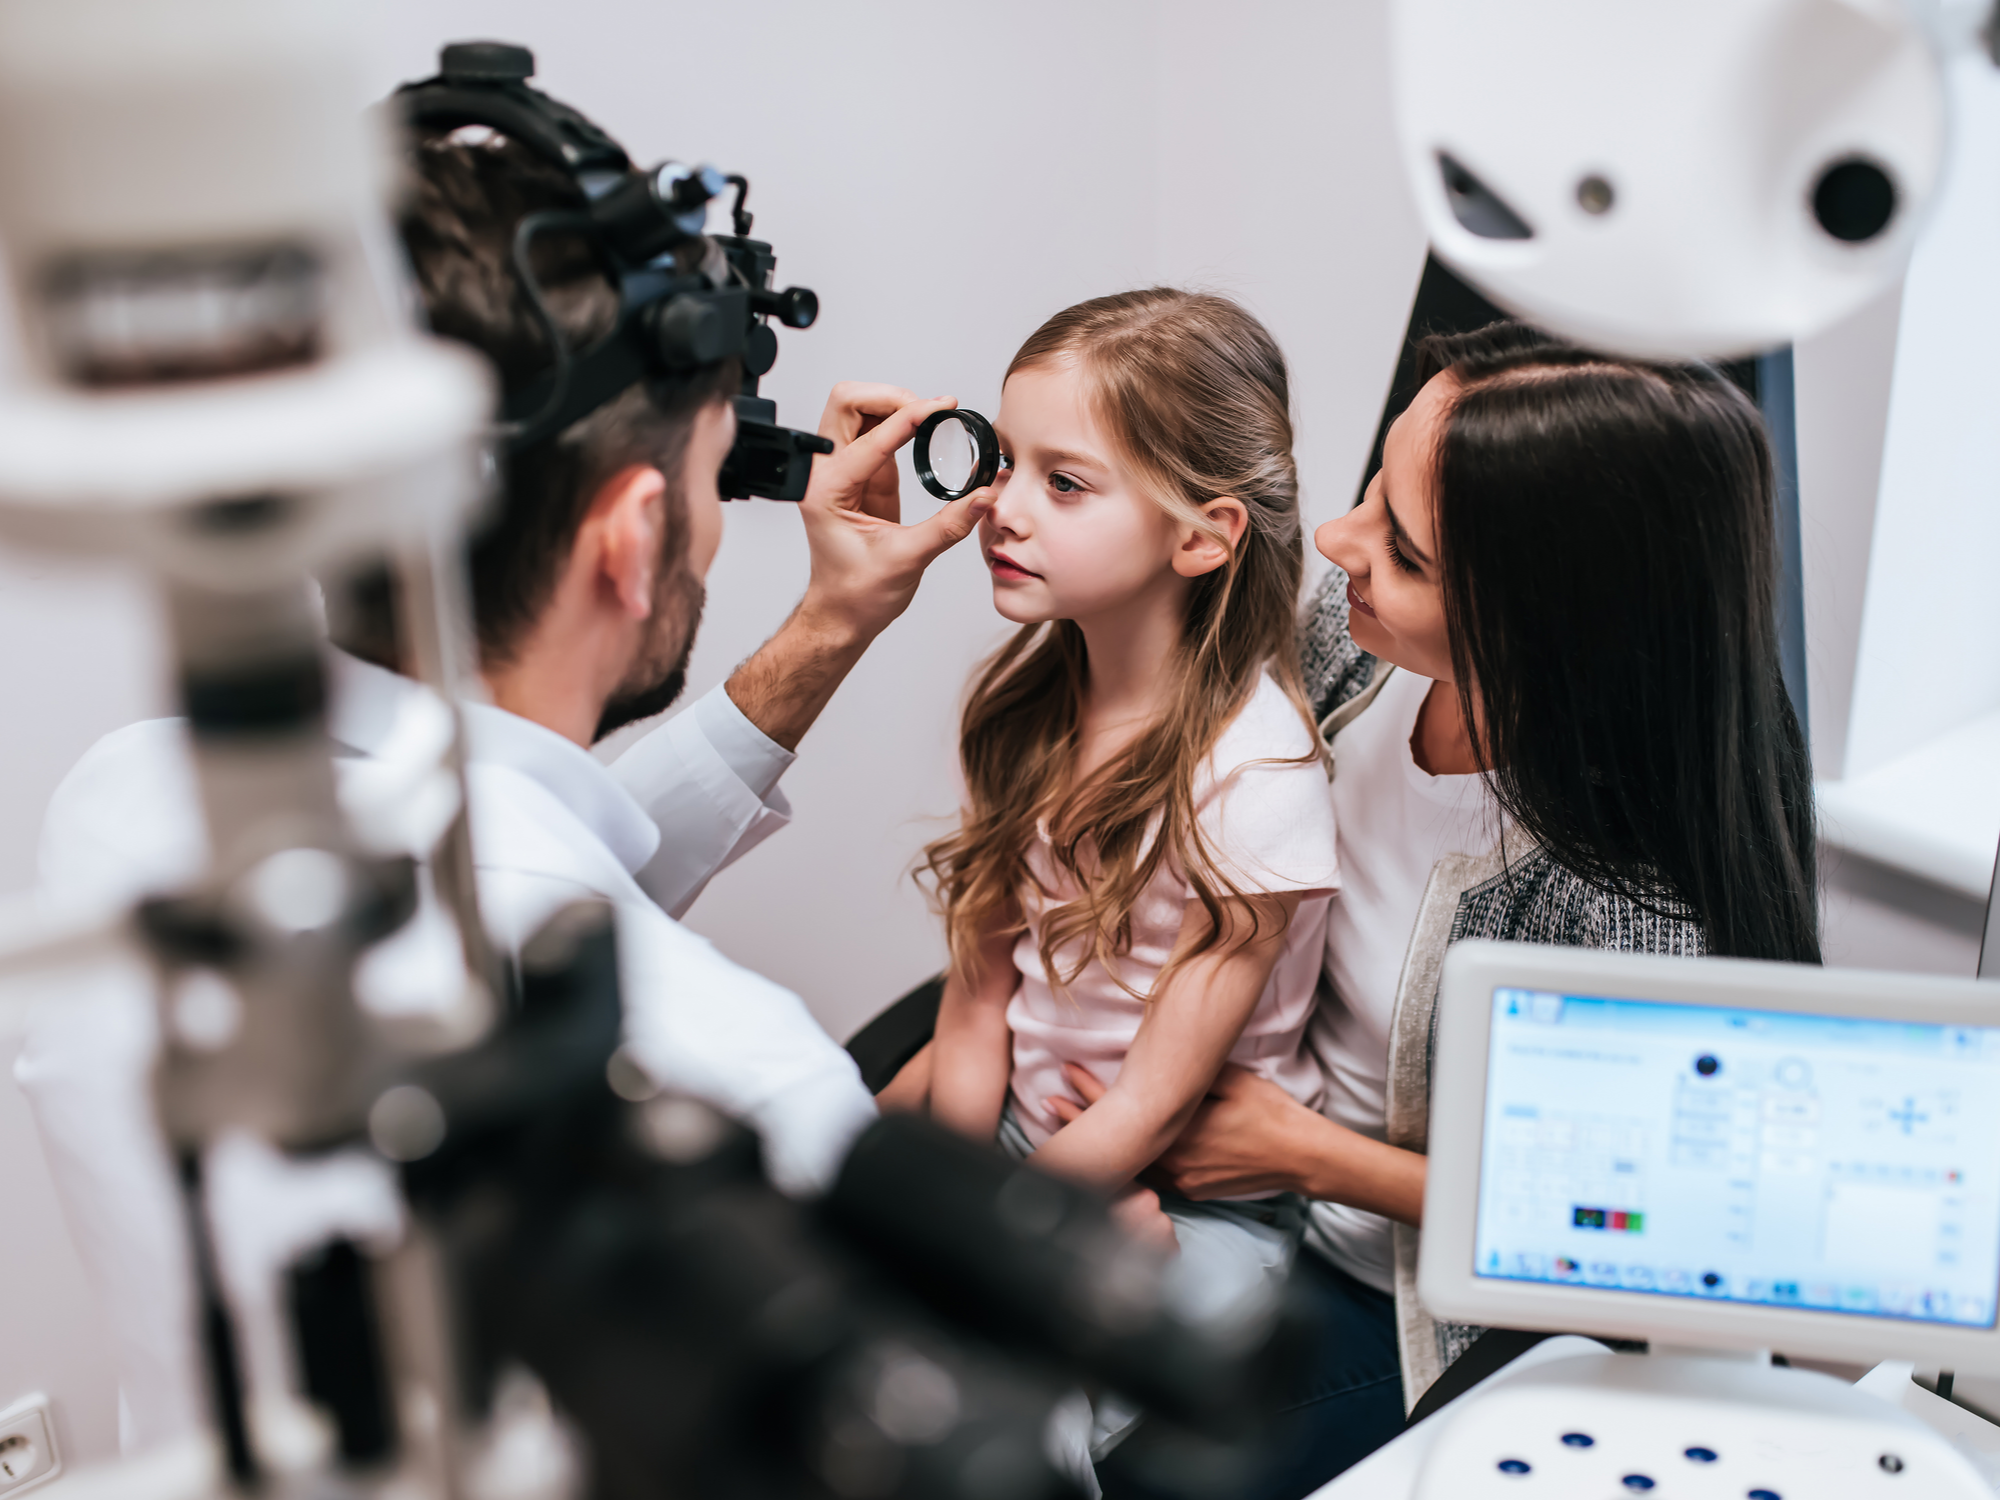 Multifocal Contact Lens for Treating Myopia in Kids